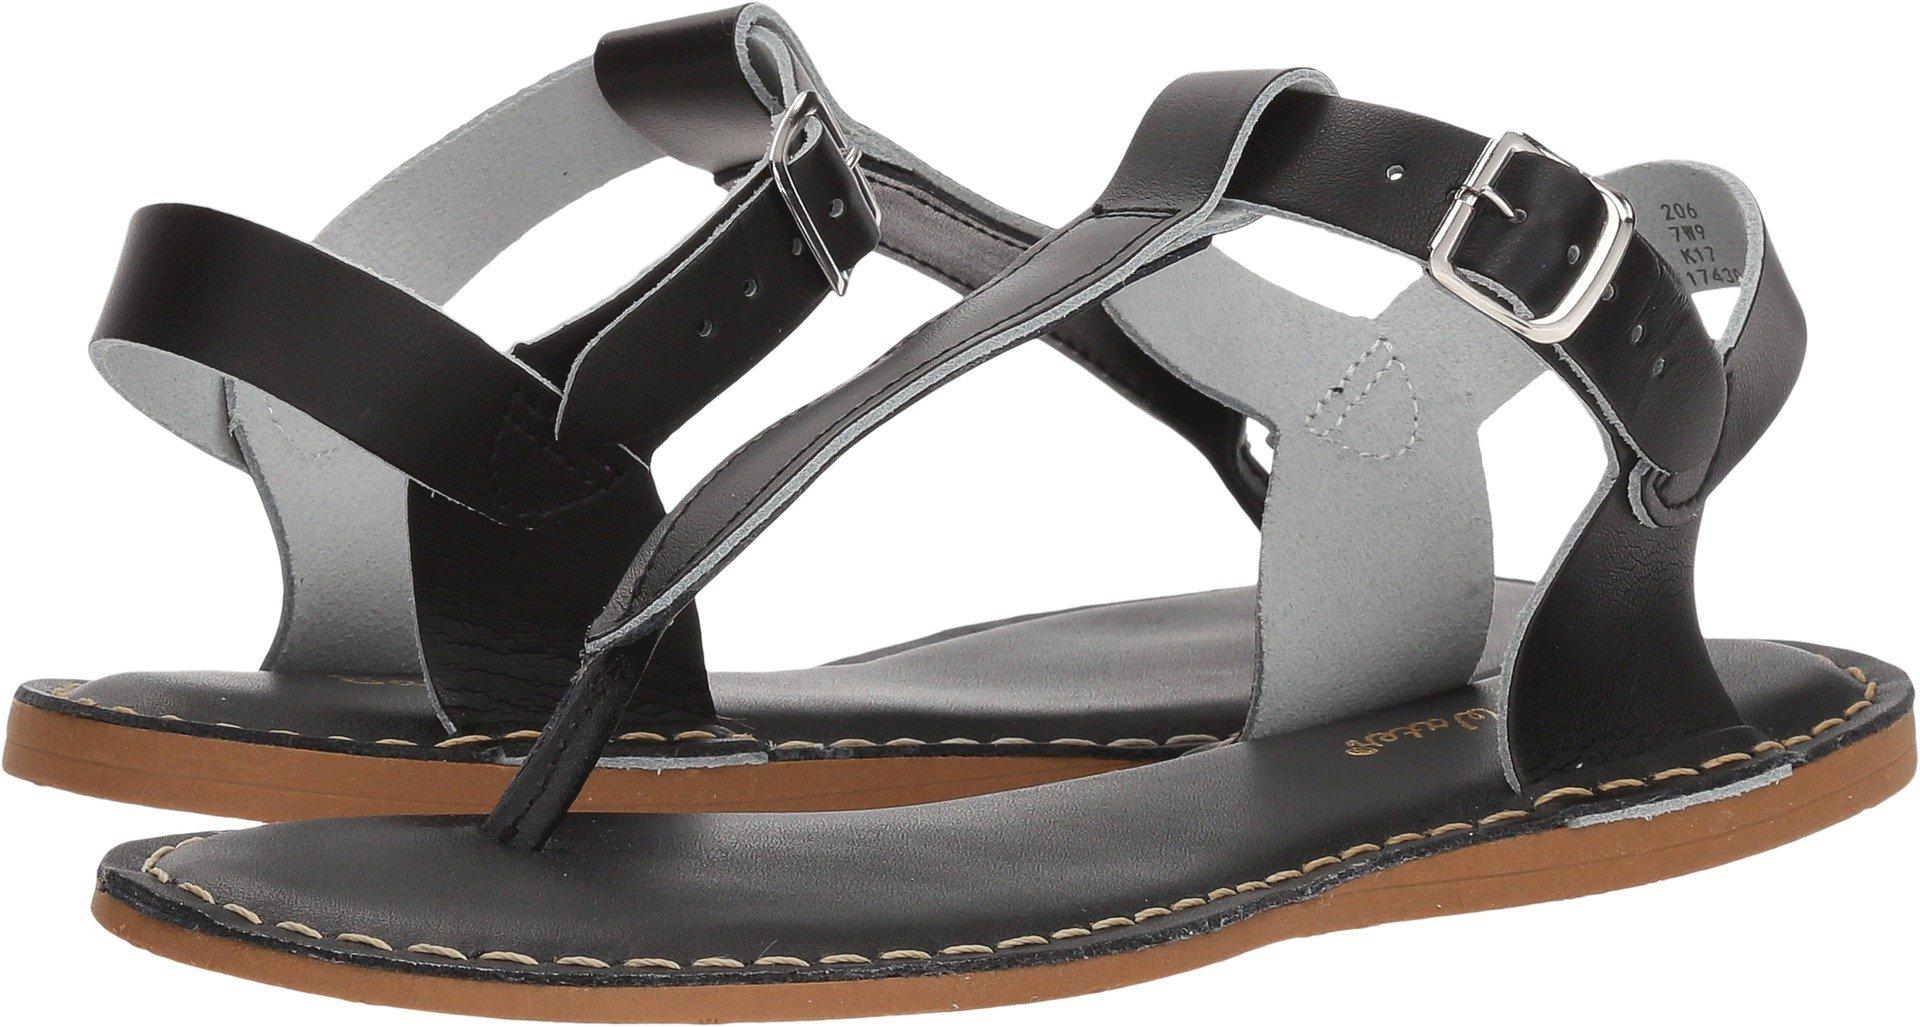 Salt Water Style 200 T-Thong Sandal,Black,6 M US Big Kid 8 M US Women's